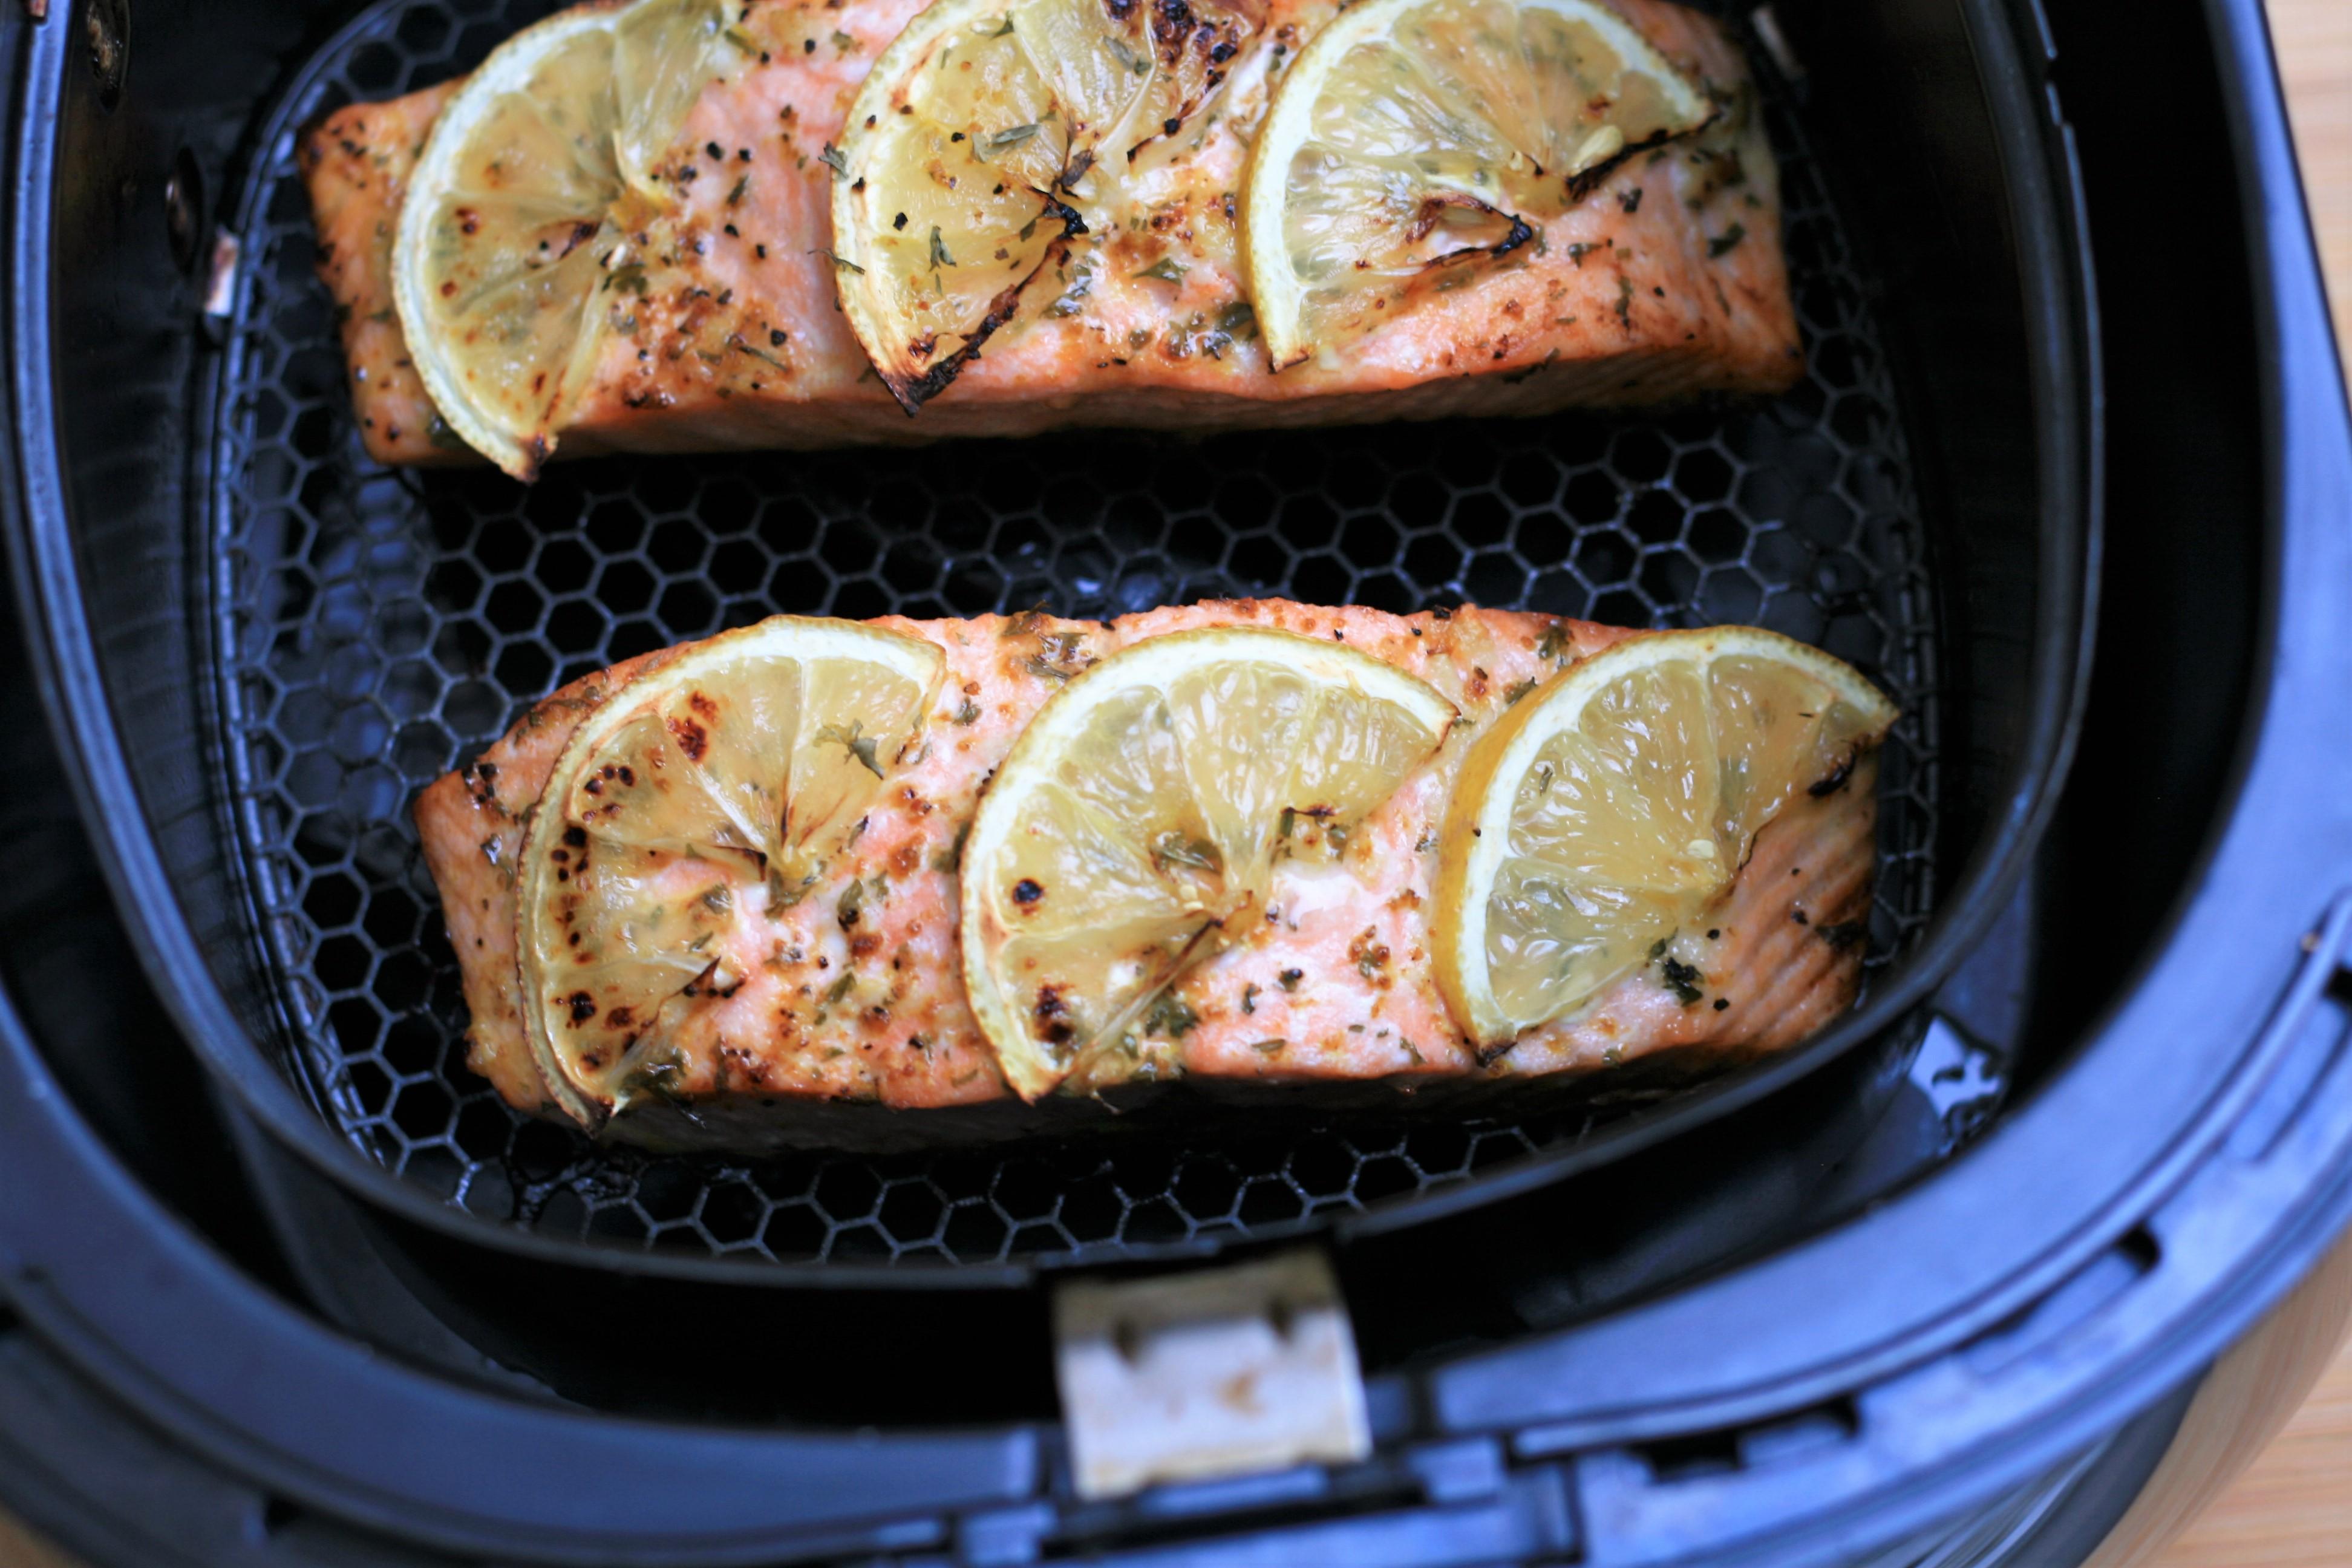 Lemon-Garlic Air Fryer Salmon